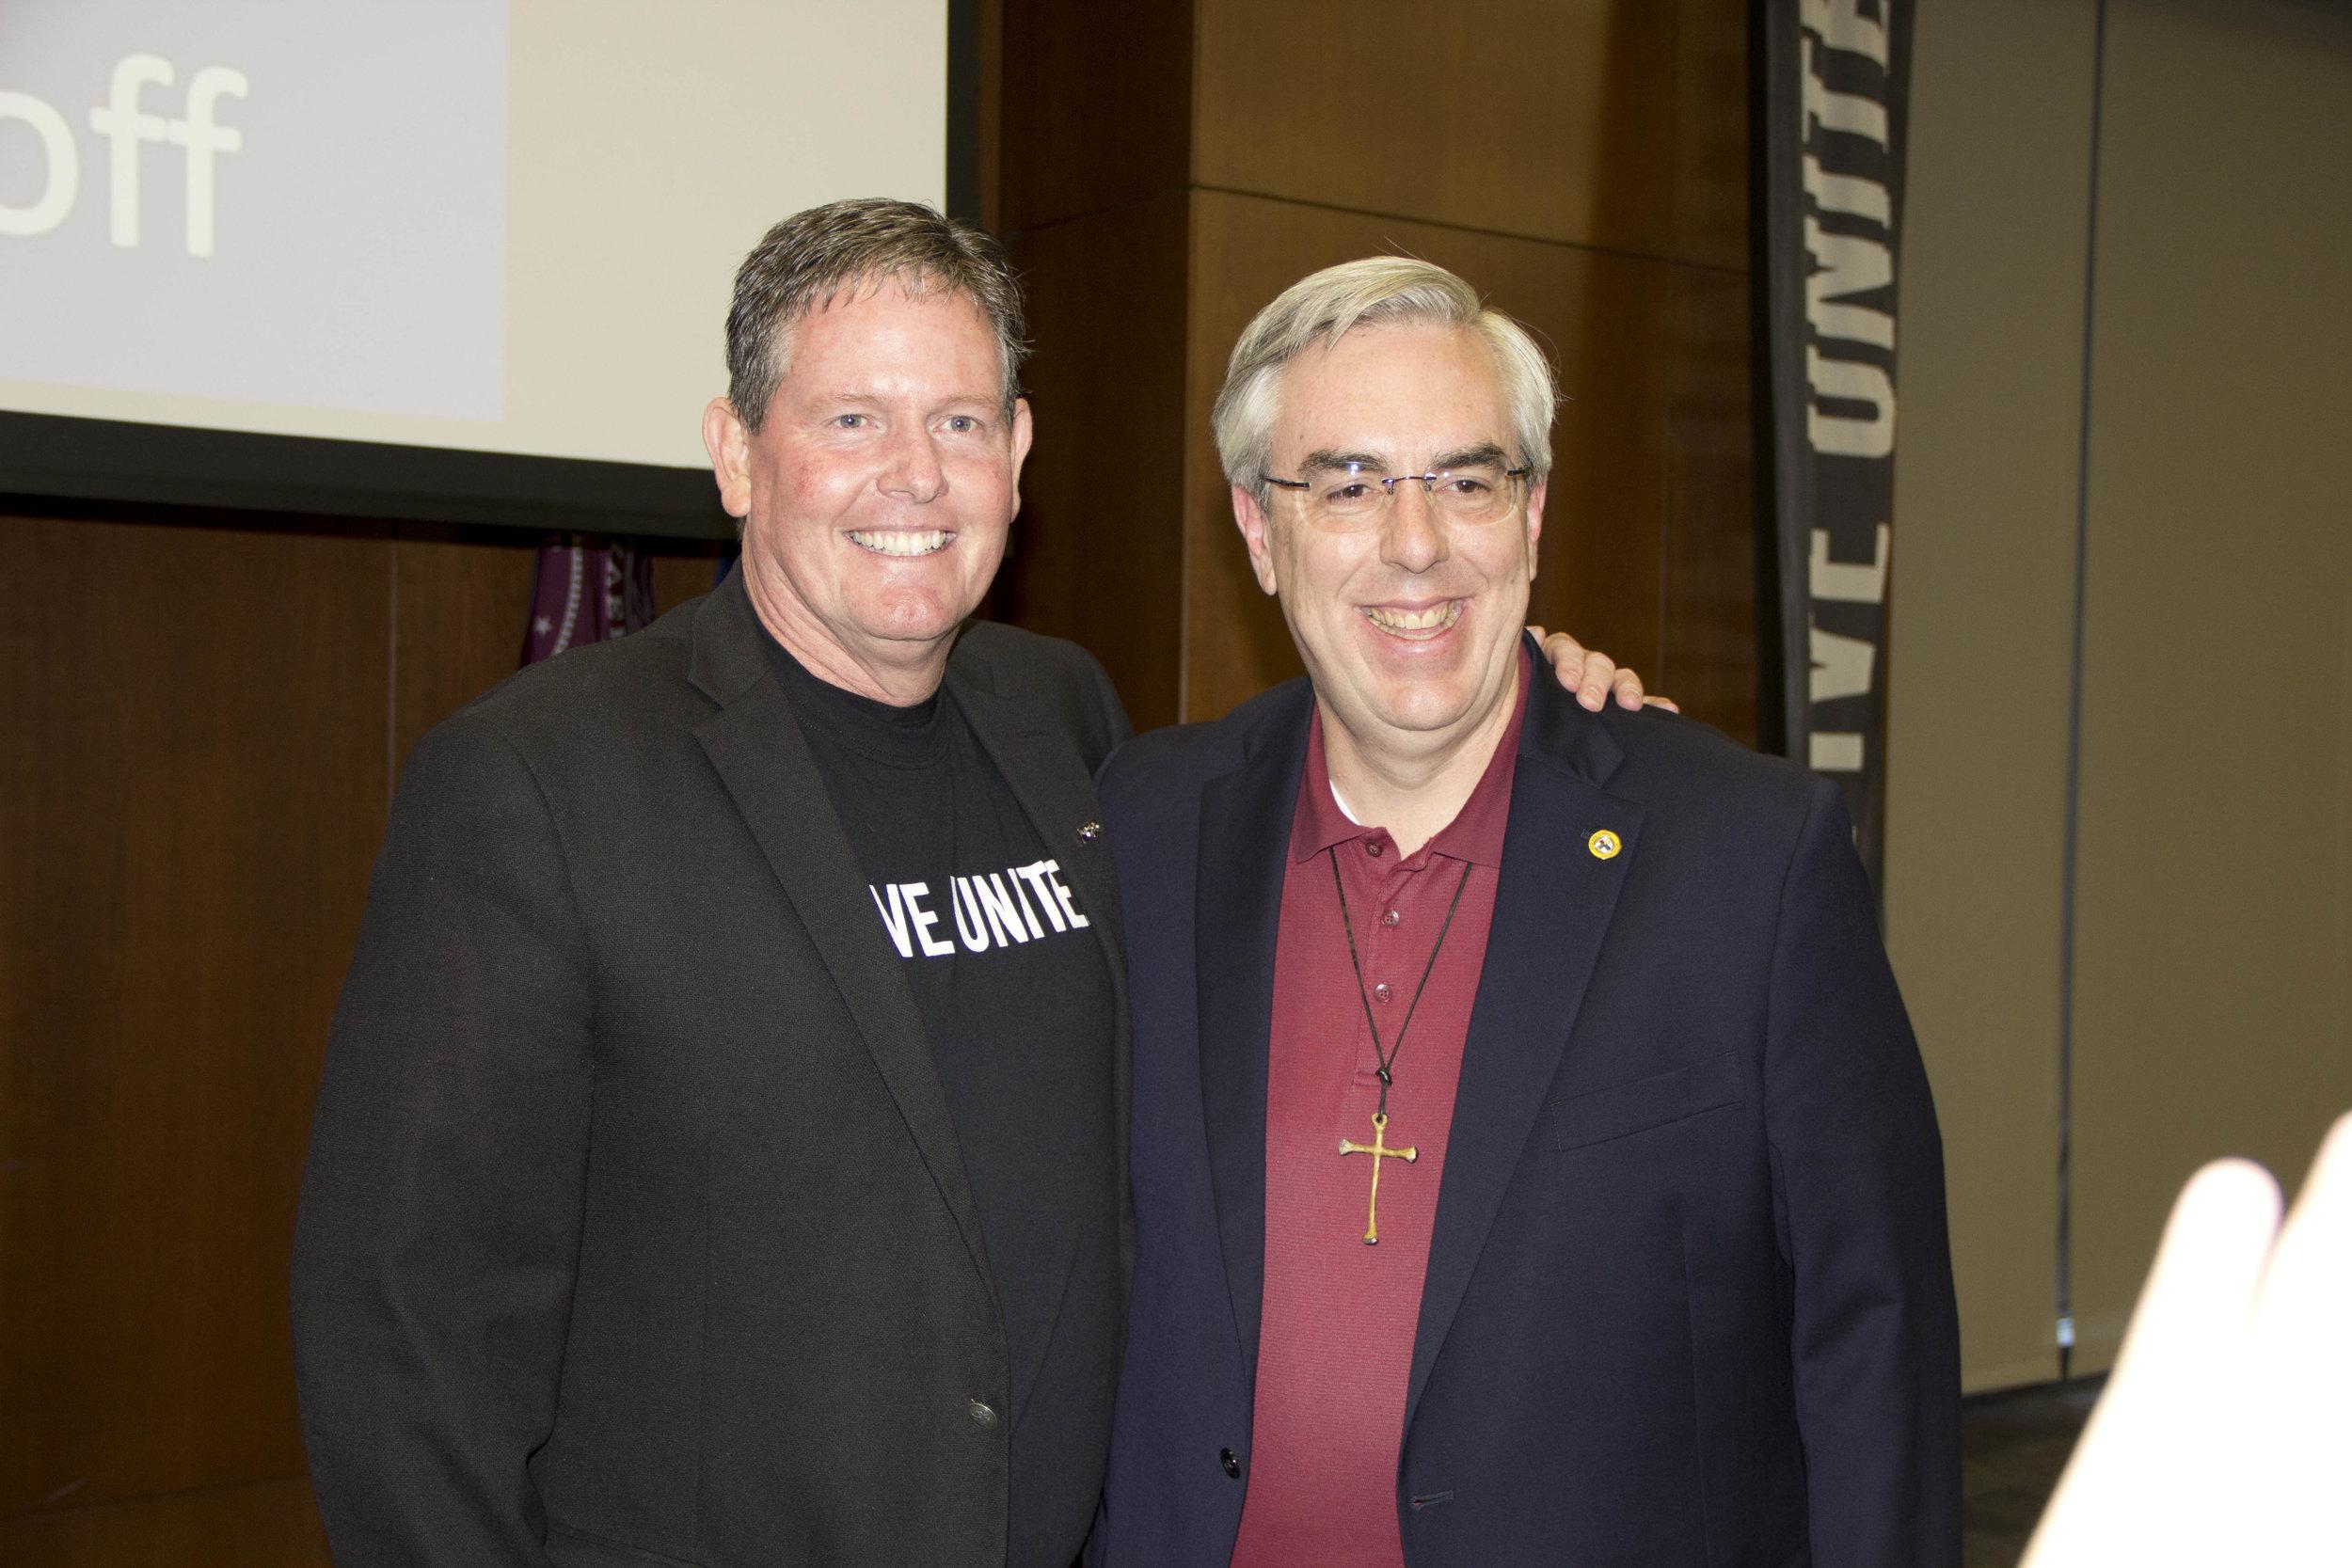 Mark Bledsoe and Dr. Brad Morgan